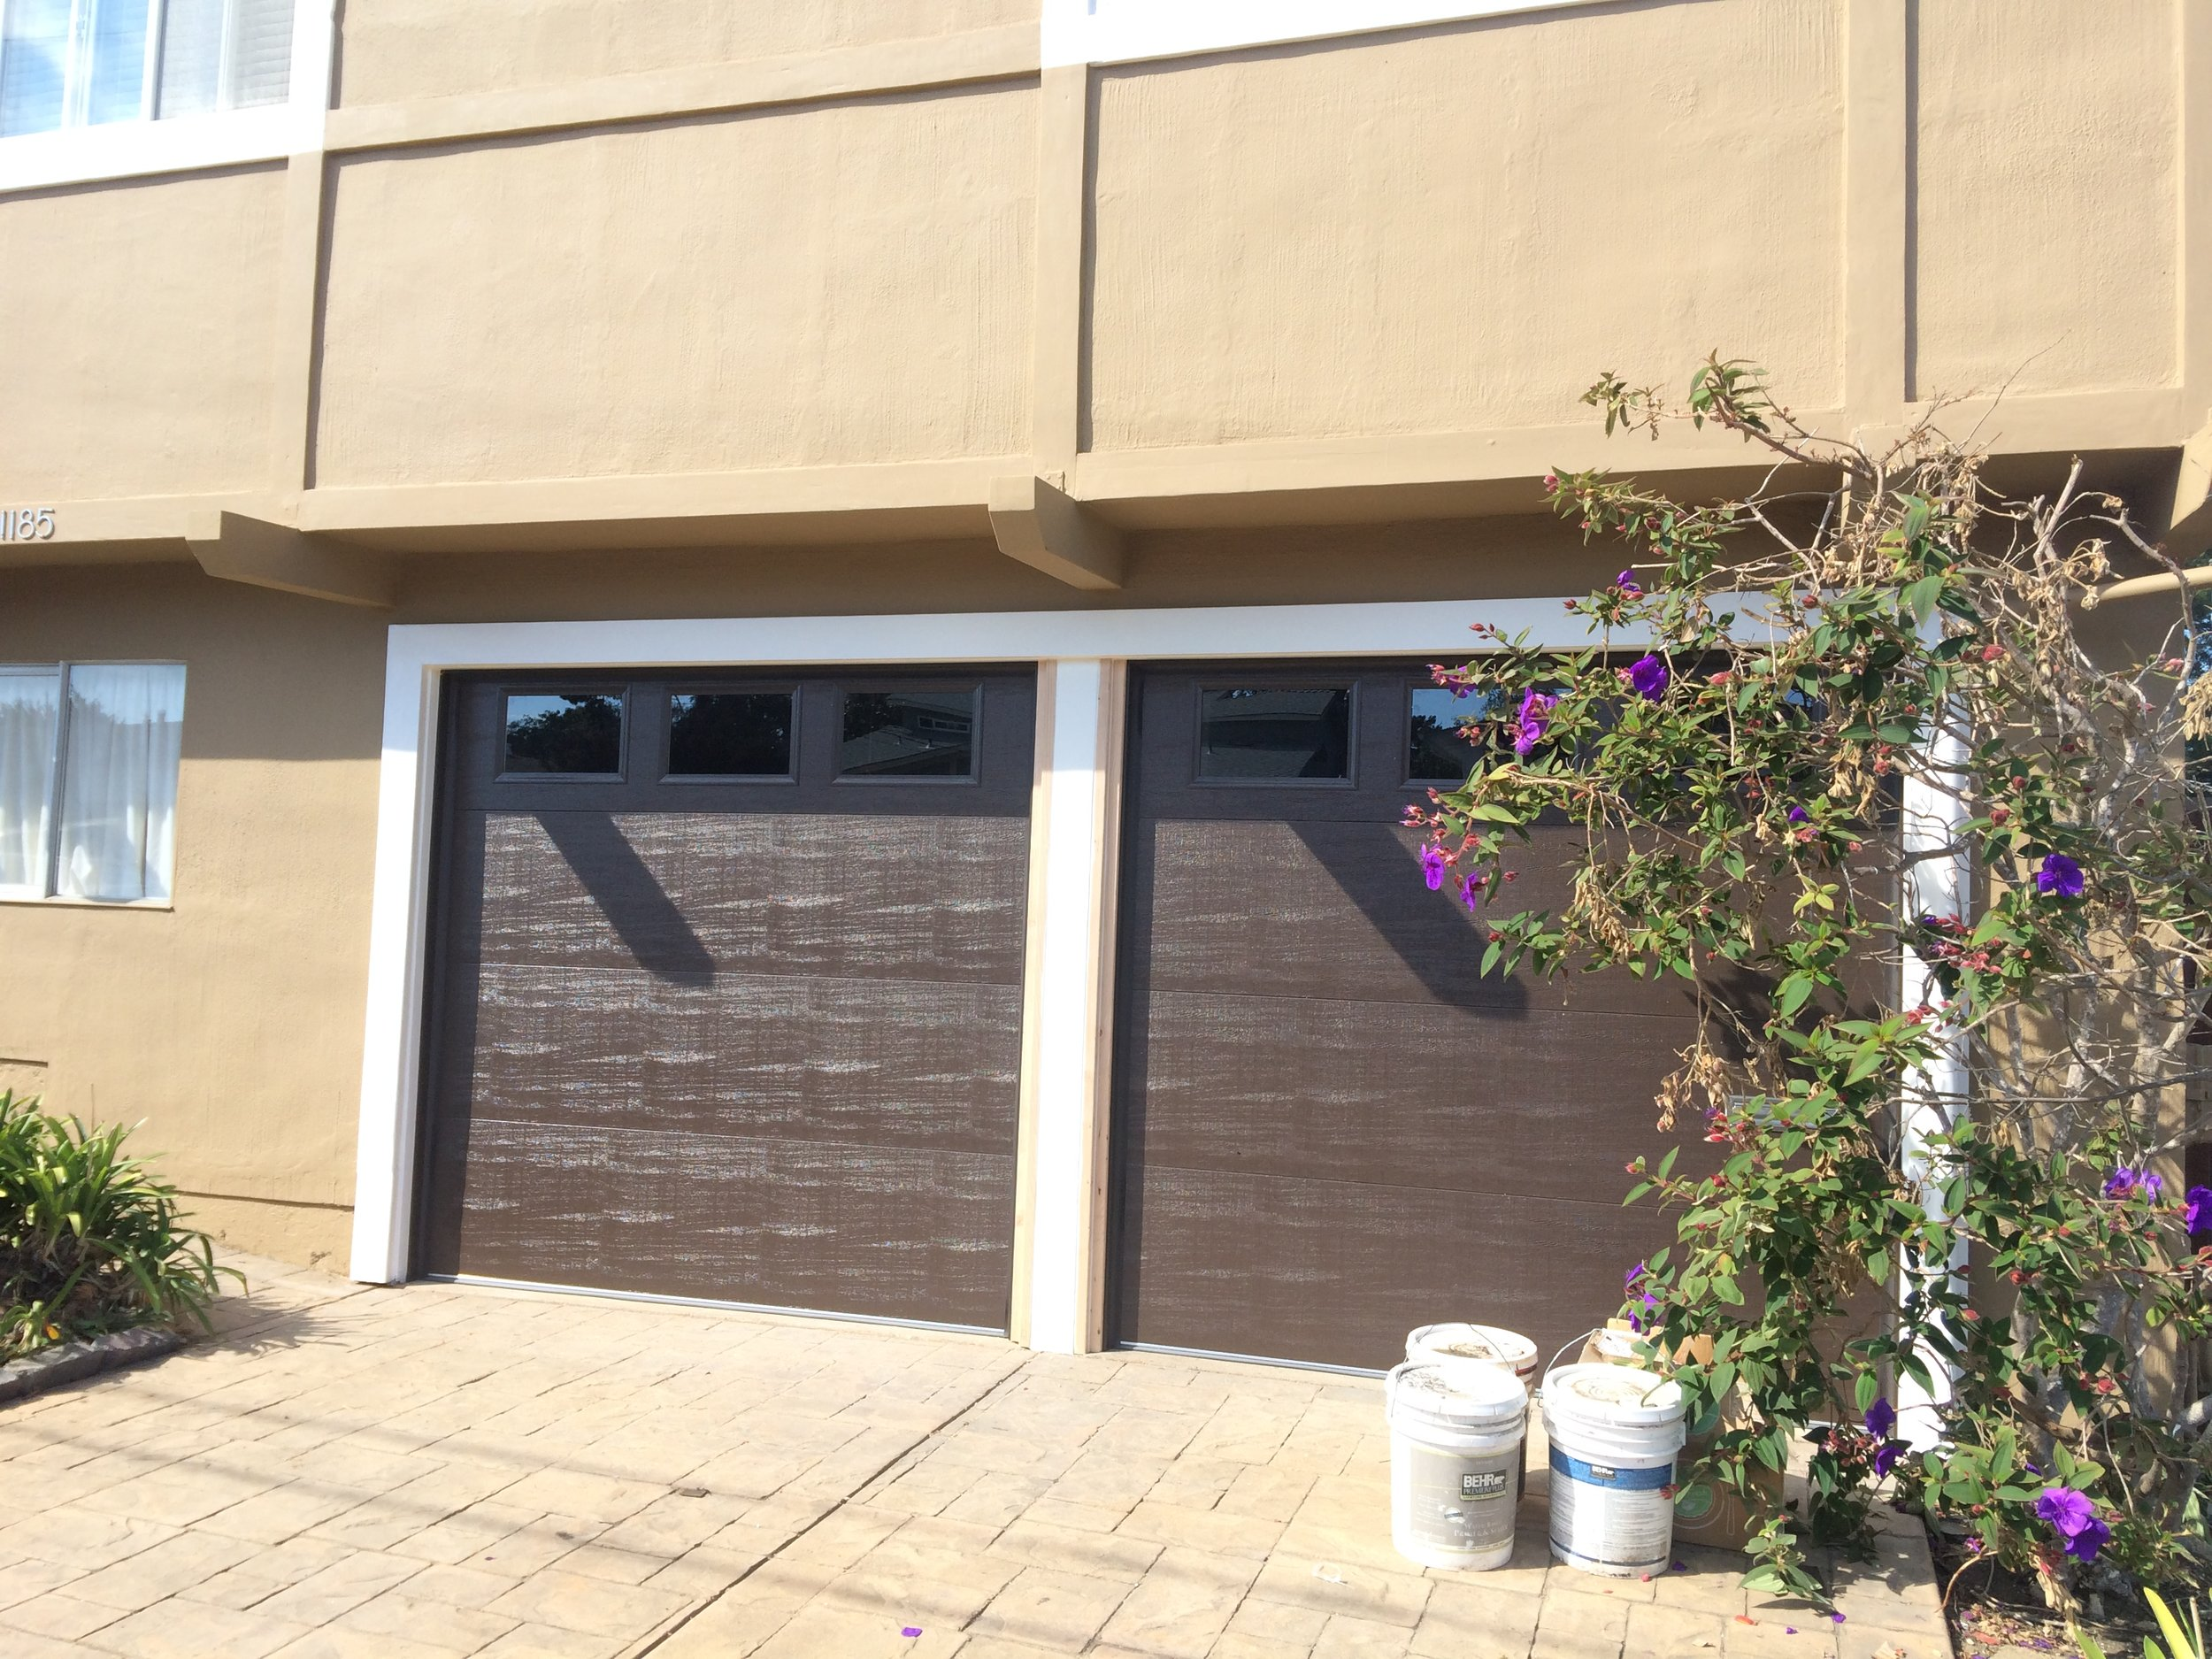 All Bay Garage Doors - Flush Panel Garage Doors - Kevin Chervatin - 52.JPG